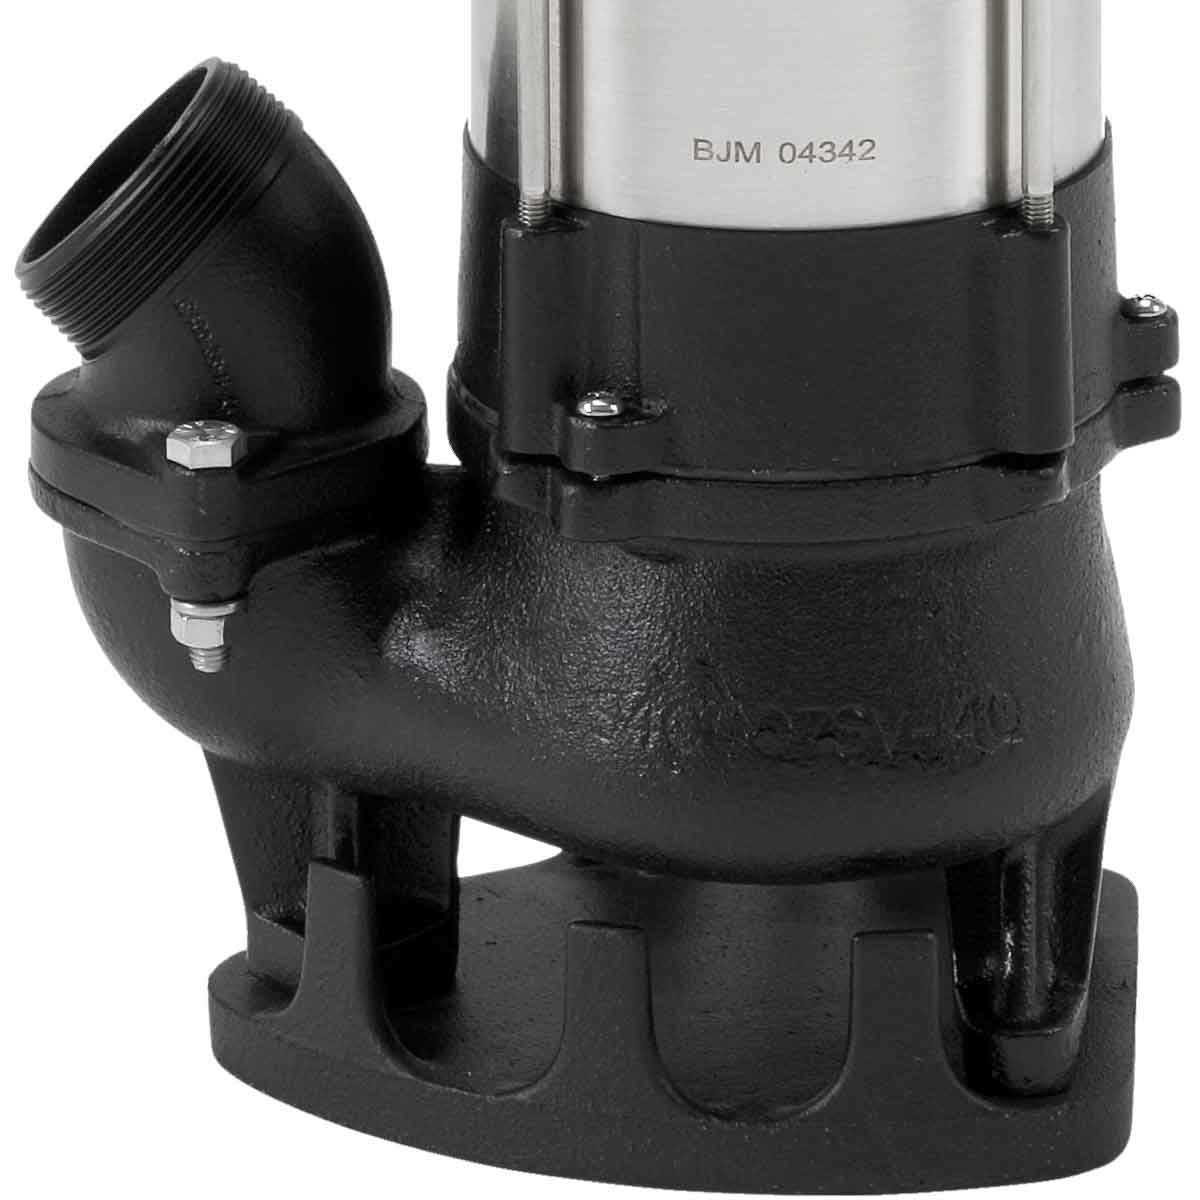 2 inch Submersible Pump 110V BJM